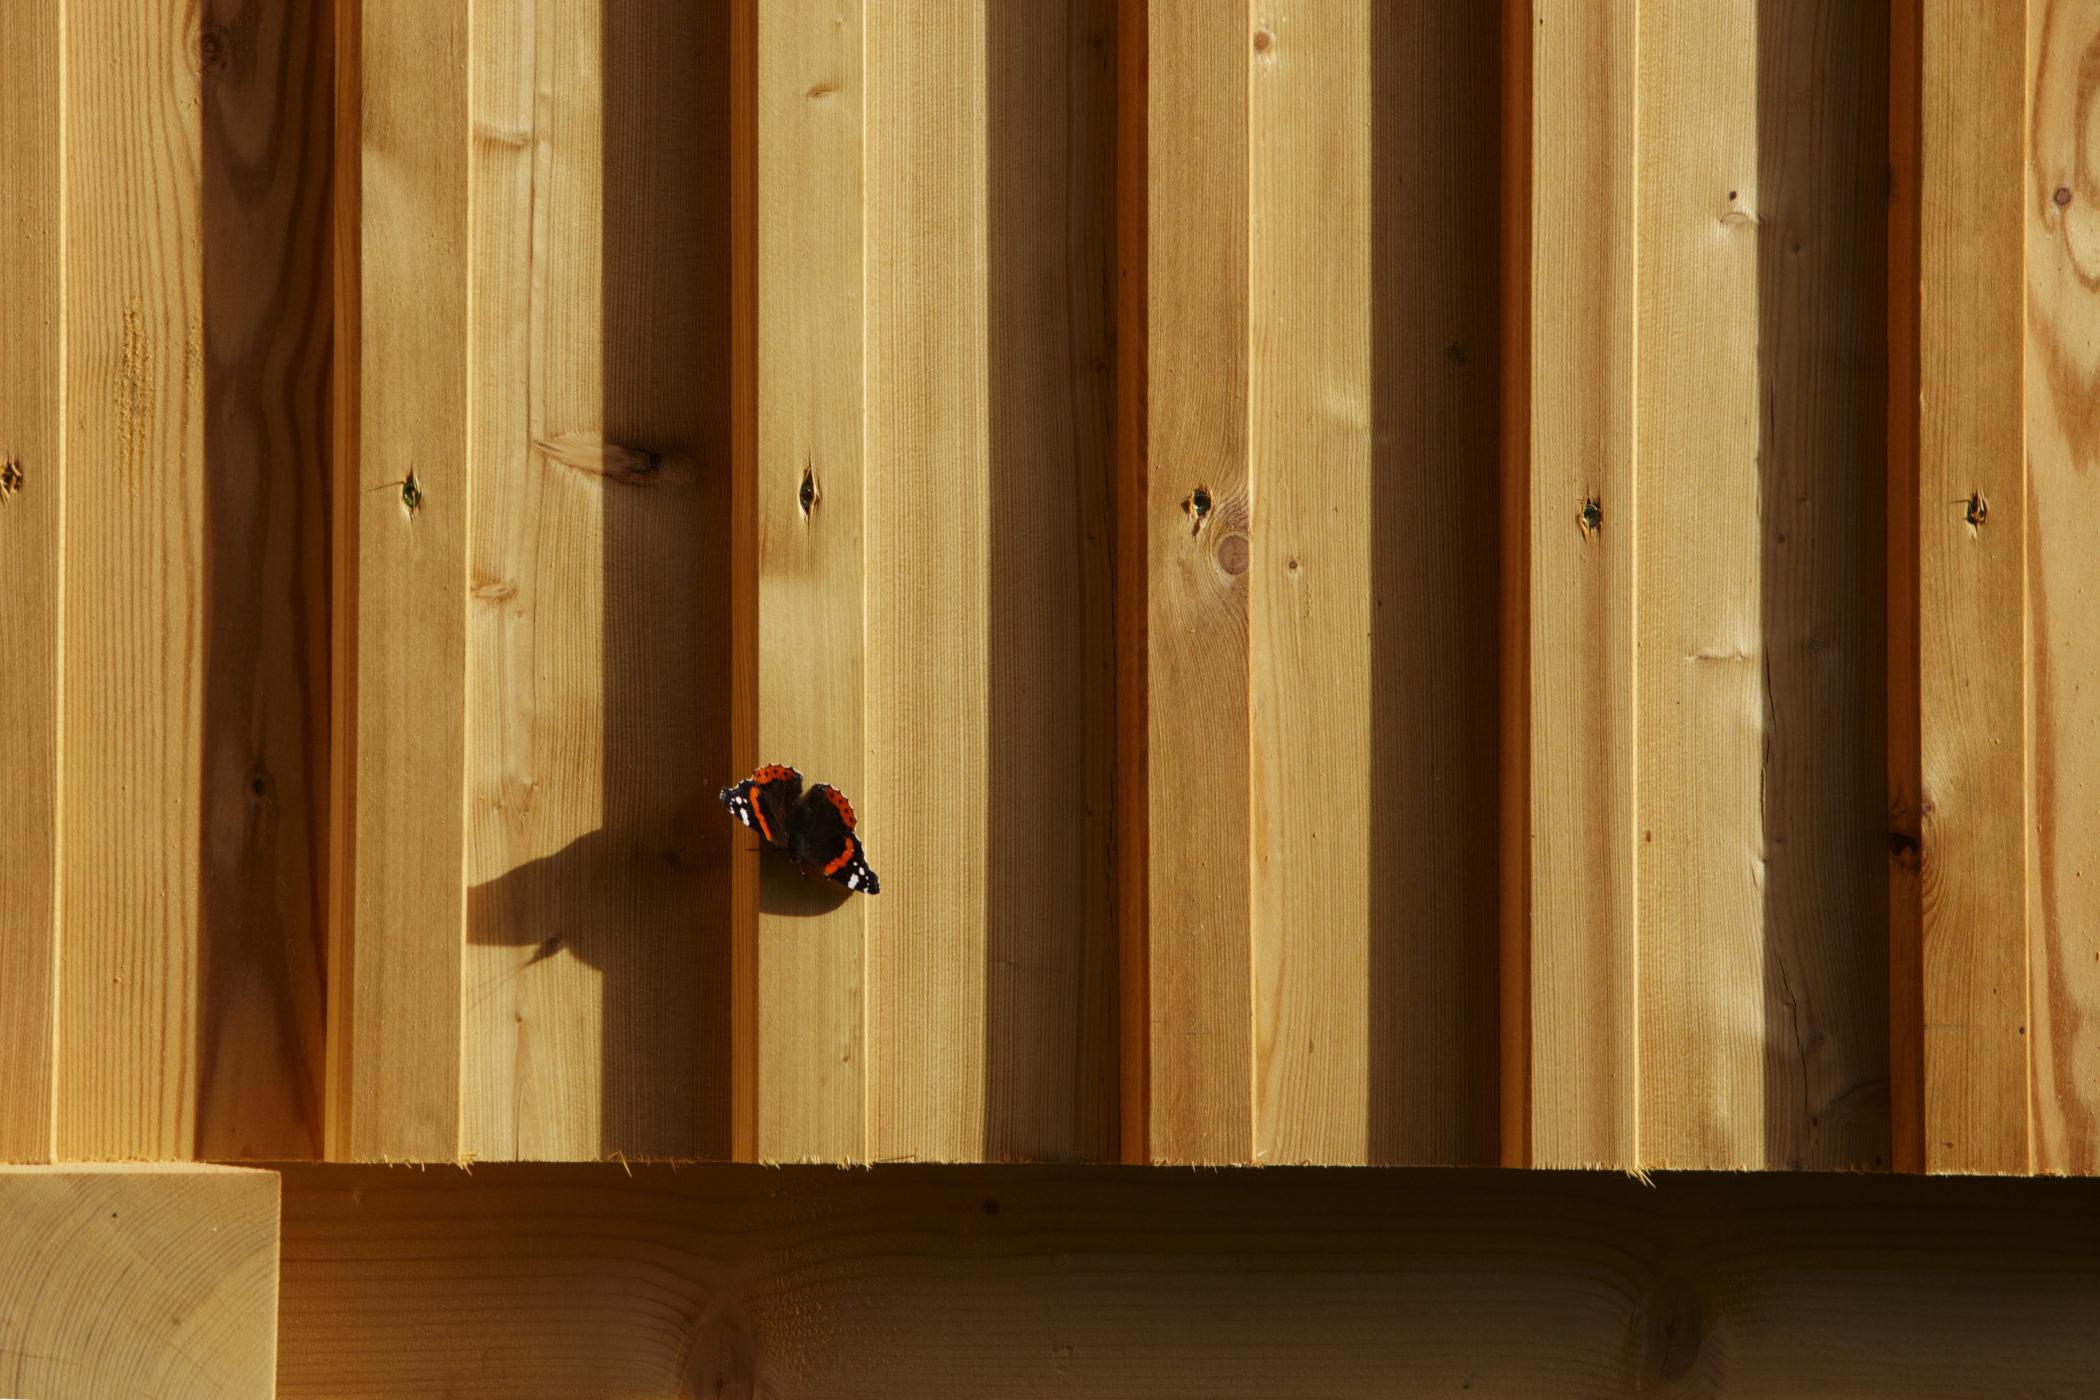 Holz, Schmetterling, Werbefoto,